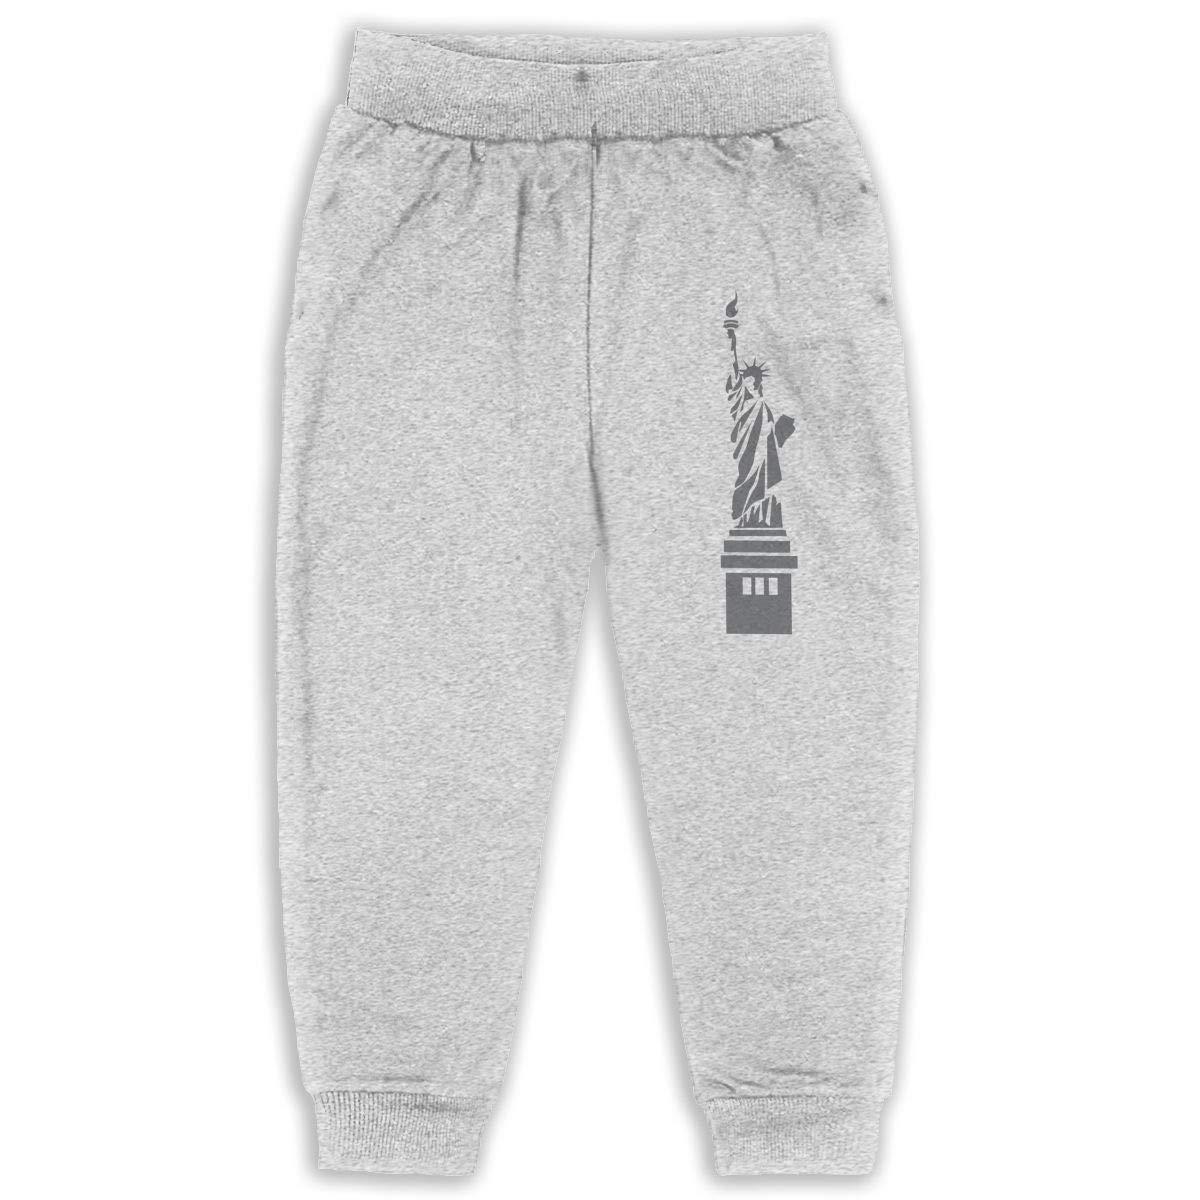 DaXi1 Statue Sweatpants for Boys /& Girls Fleece Active Joggers Elastic Pants